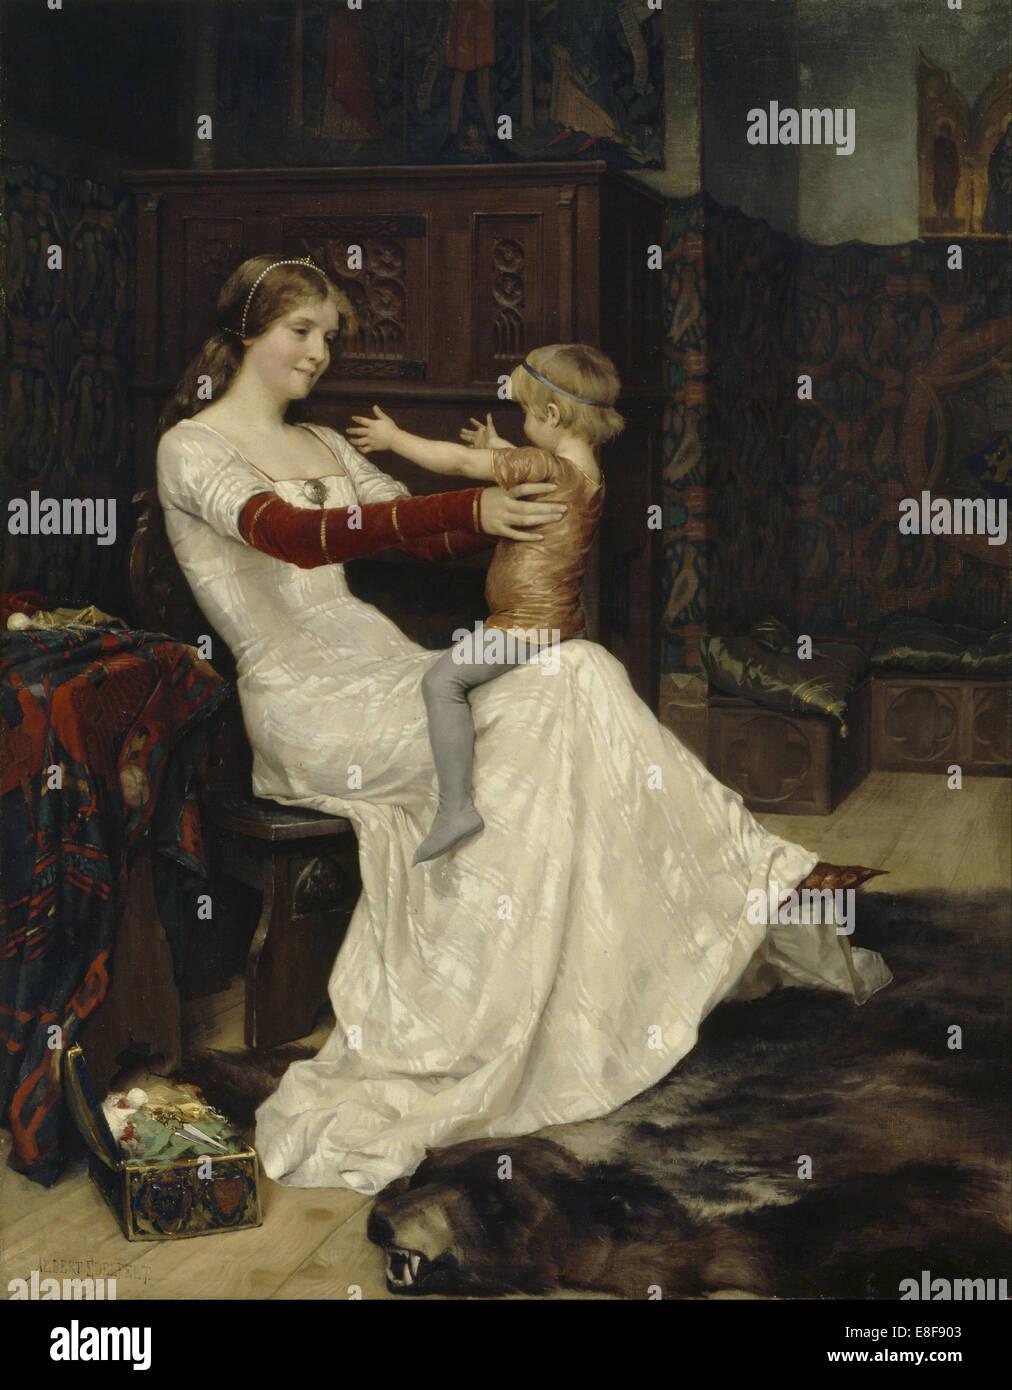 Queen Blanche of Namur. Artist: Edelfelt, Albert Gustaf Aristides (1854-1905) Stock Photo